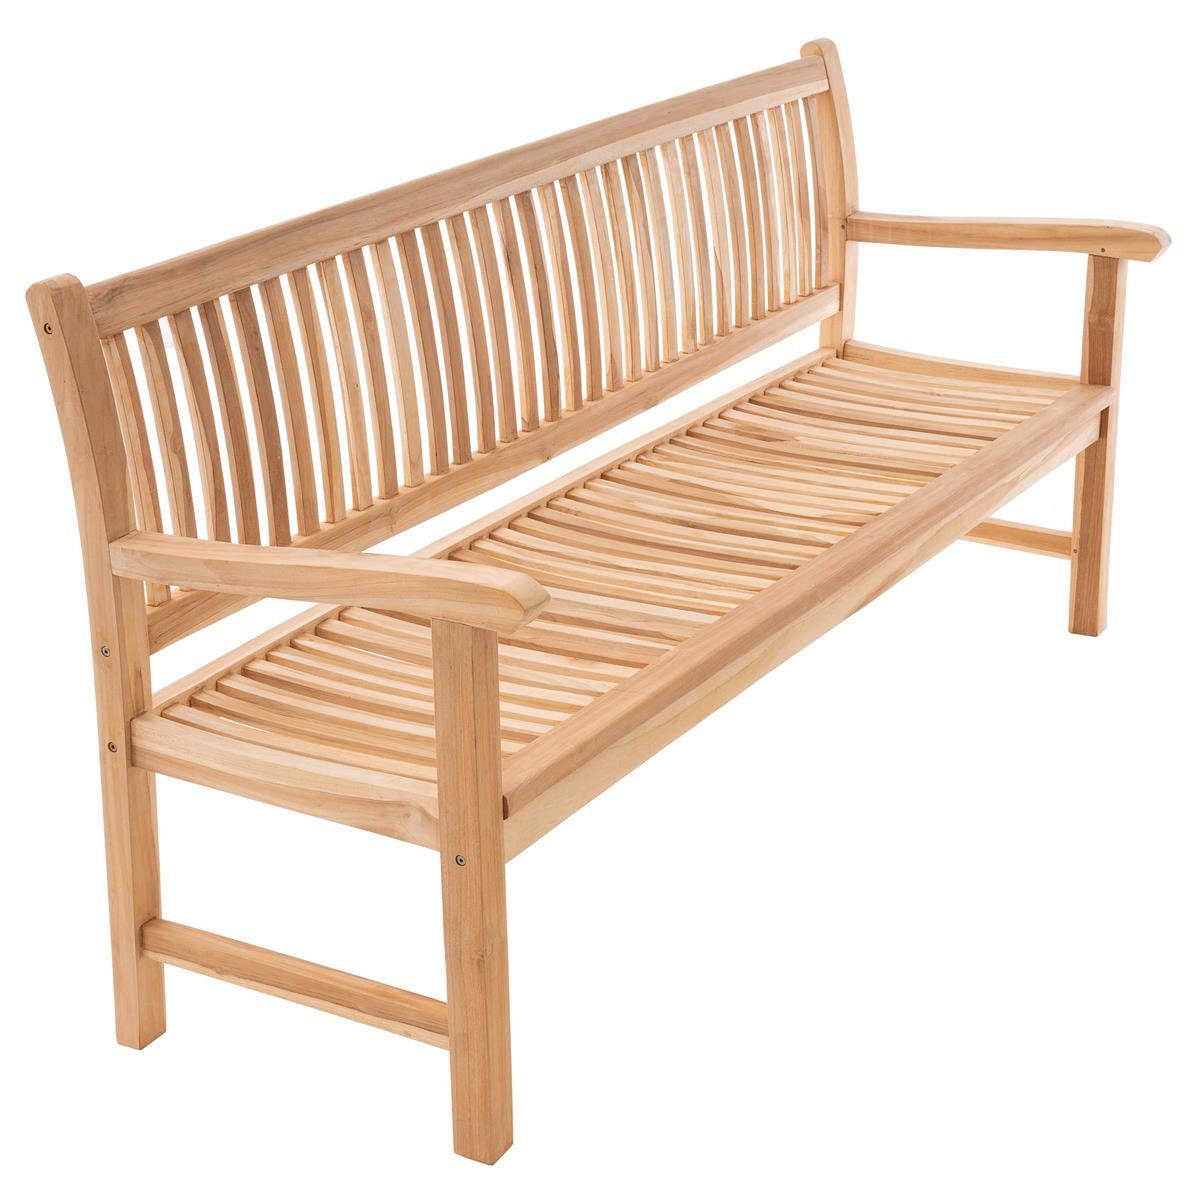 DIVERO 3-Sitzer Gartenbank Parkbank hochwertig massiv Teak Holz natur 180 cm